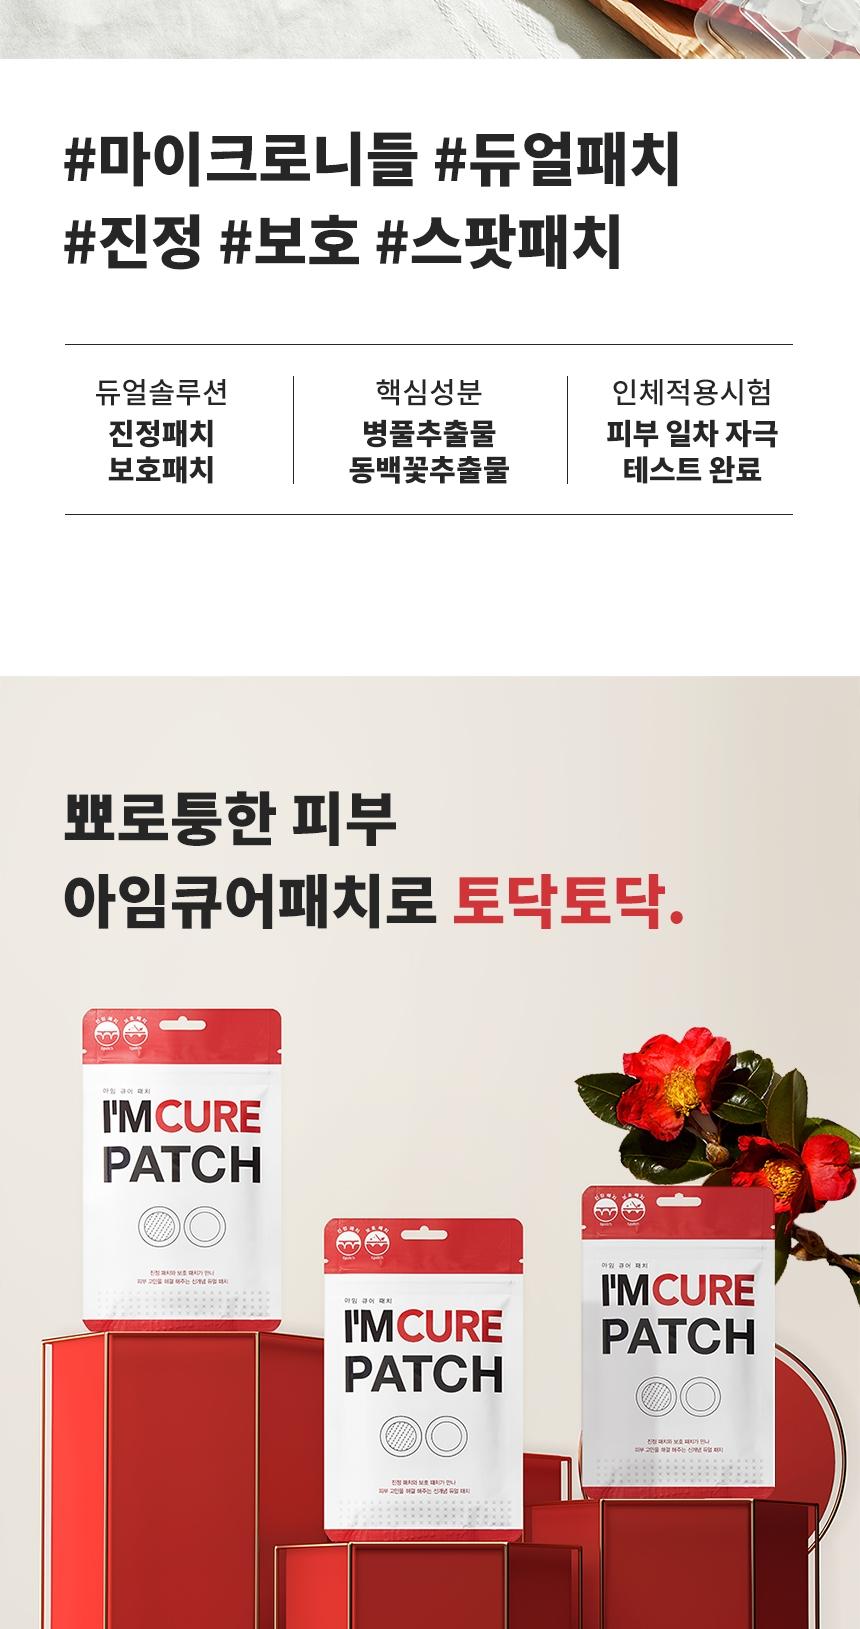 cure-patch-860-003-1-.jpg